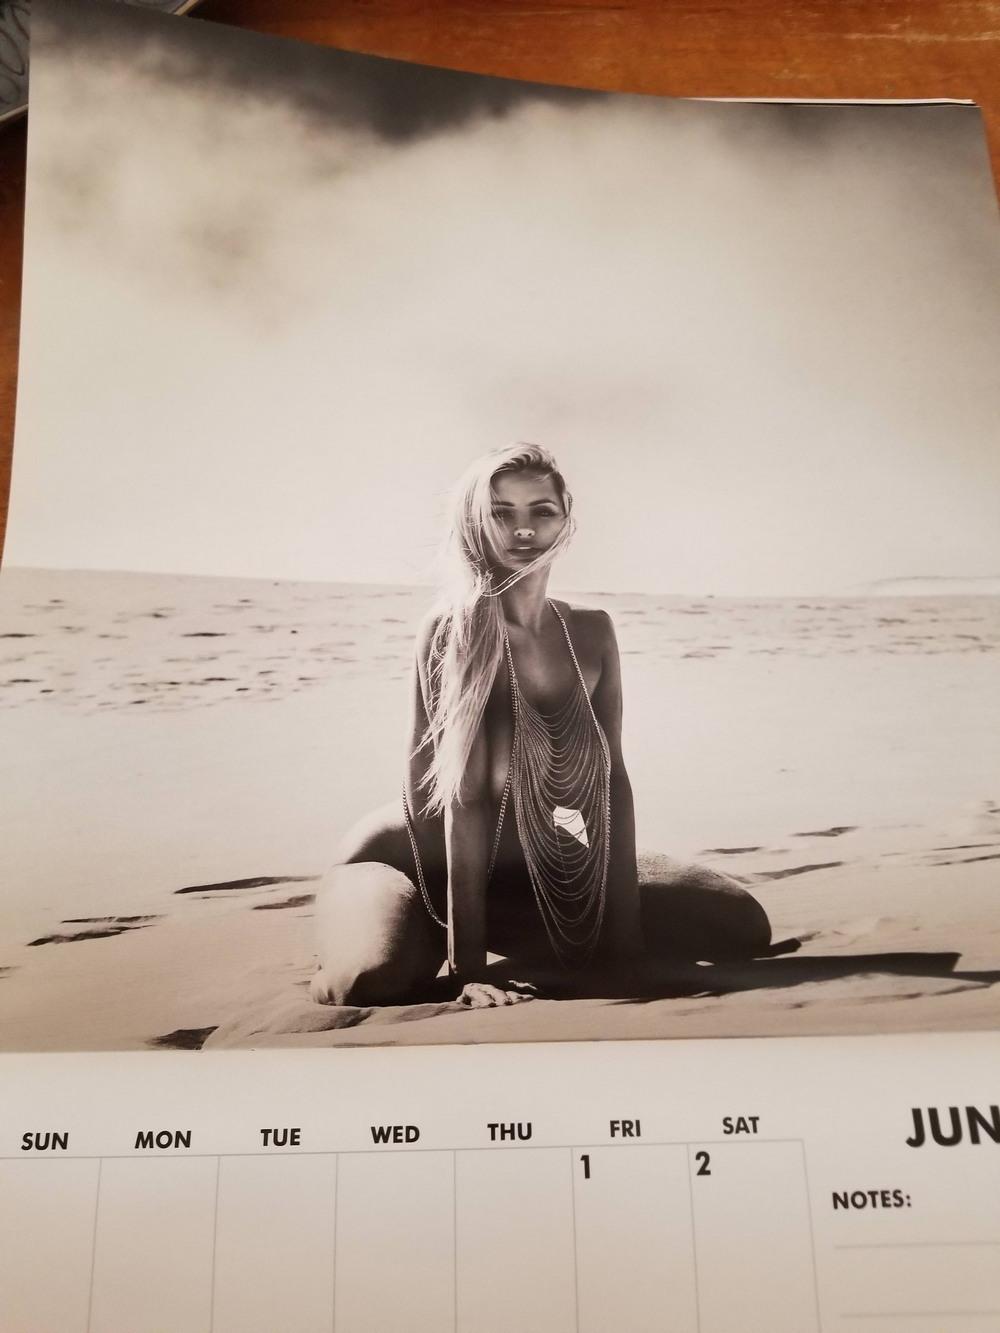 Линдси Пелас снялась для календаря